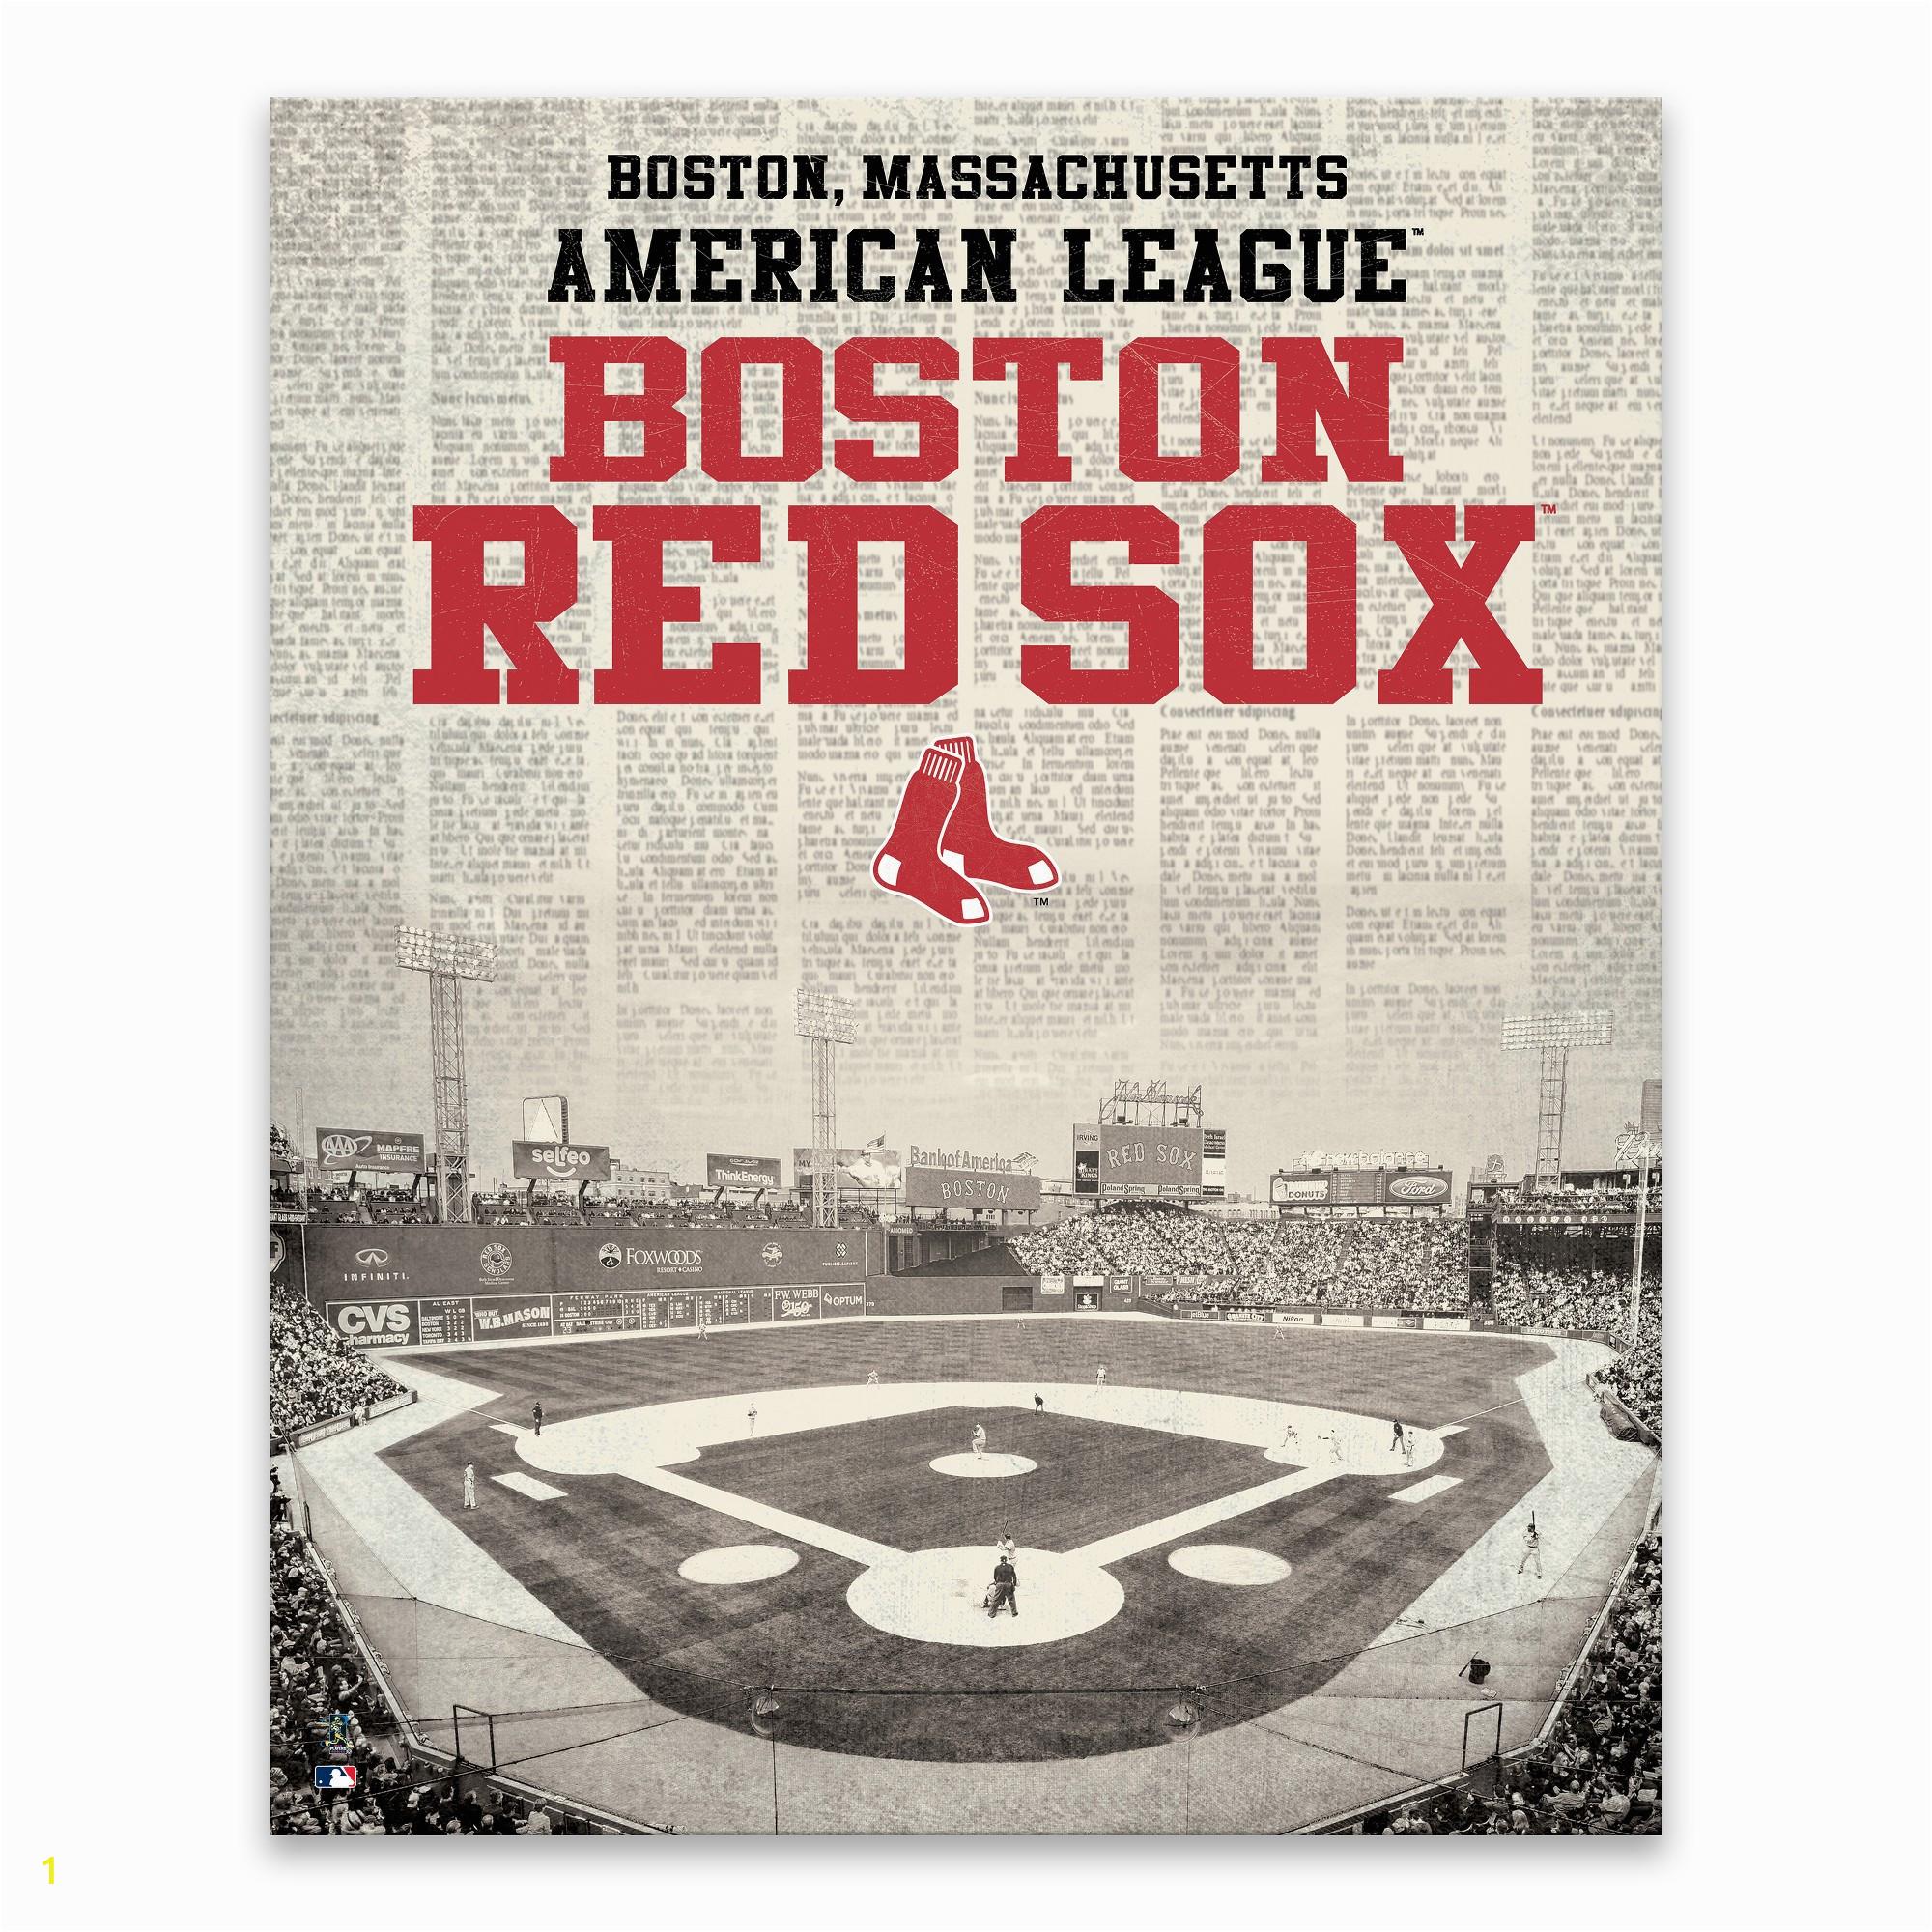 Boston Red sox Wall Murals Mlb Boston Red sox Newspaper Stadium Printed Canvas Art 22